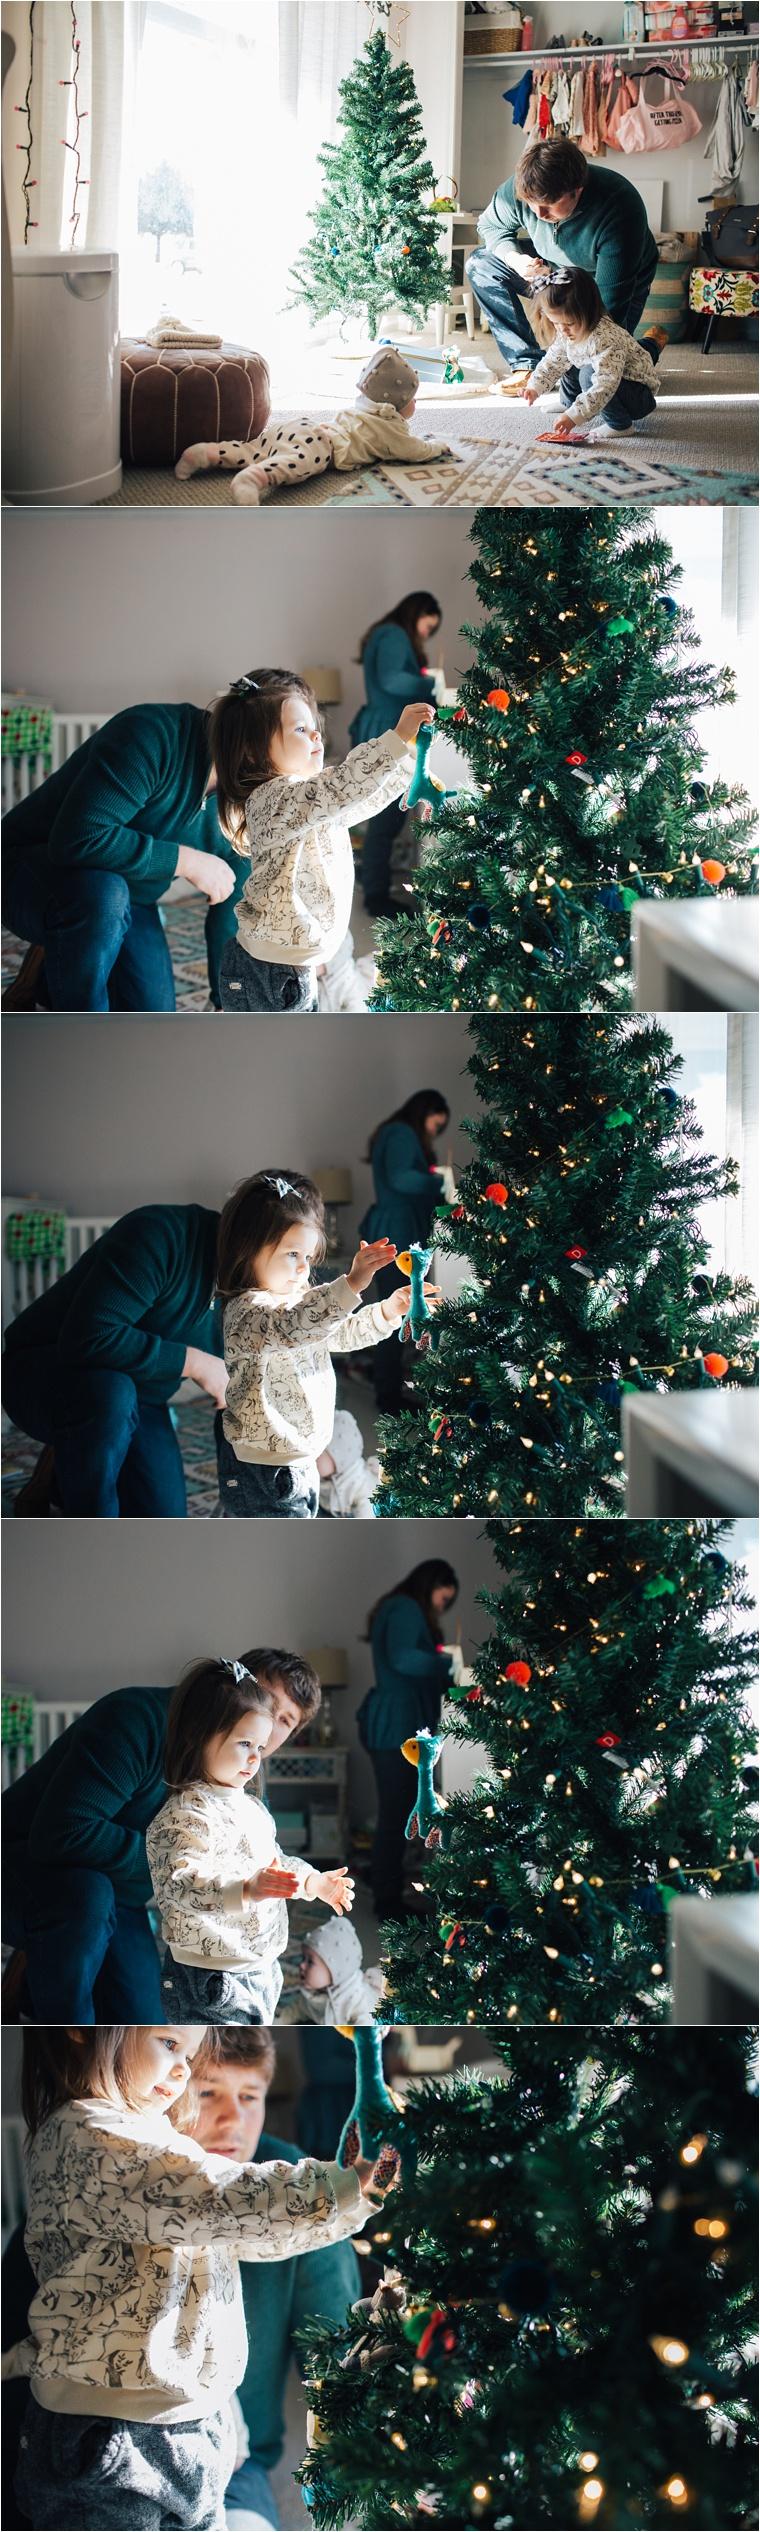 kansascityfamilyphotographer_0207